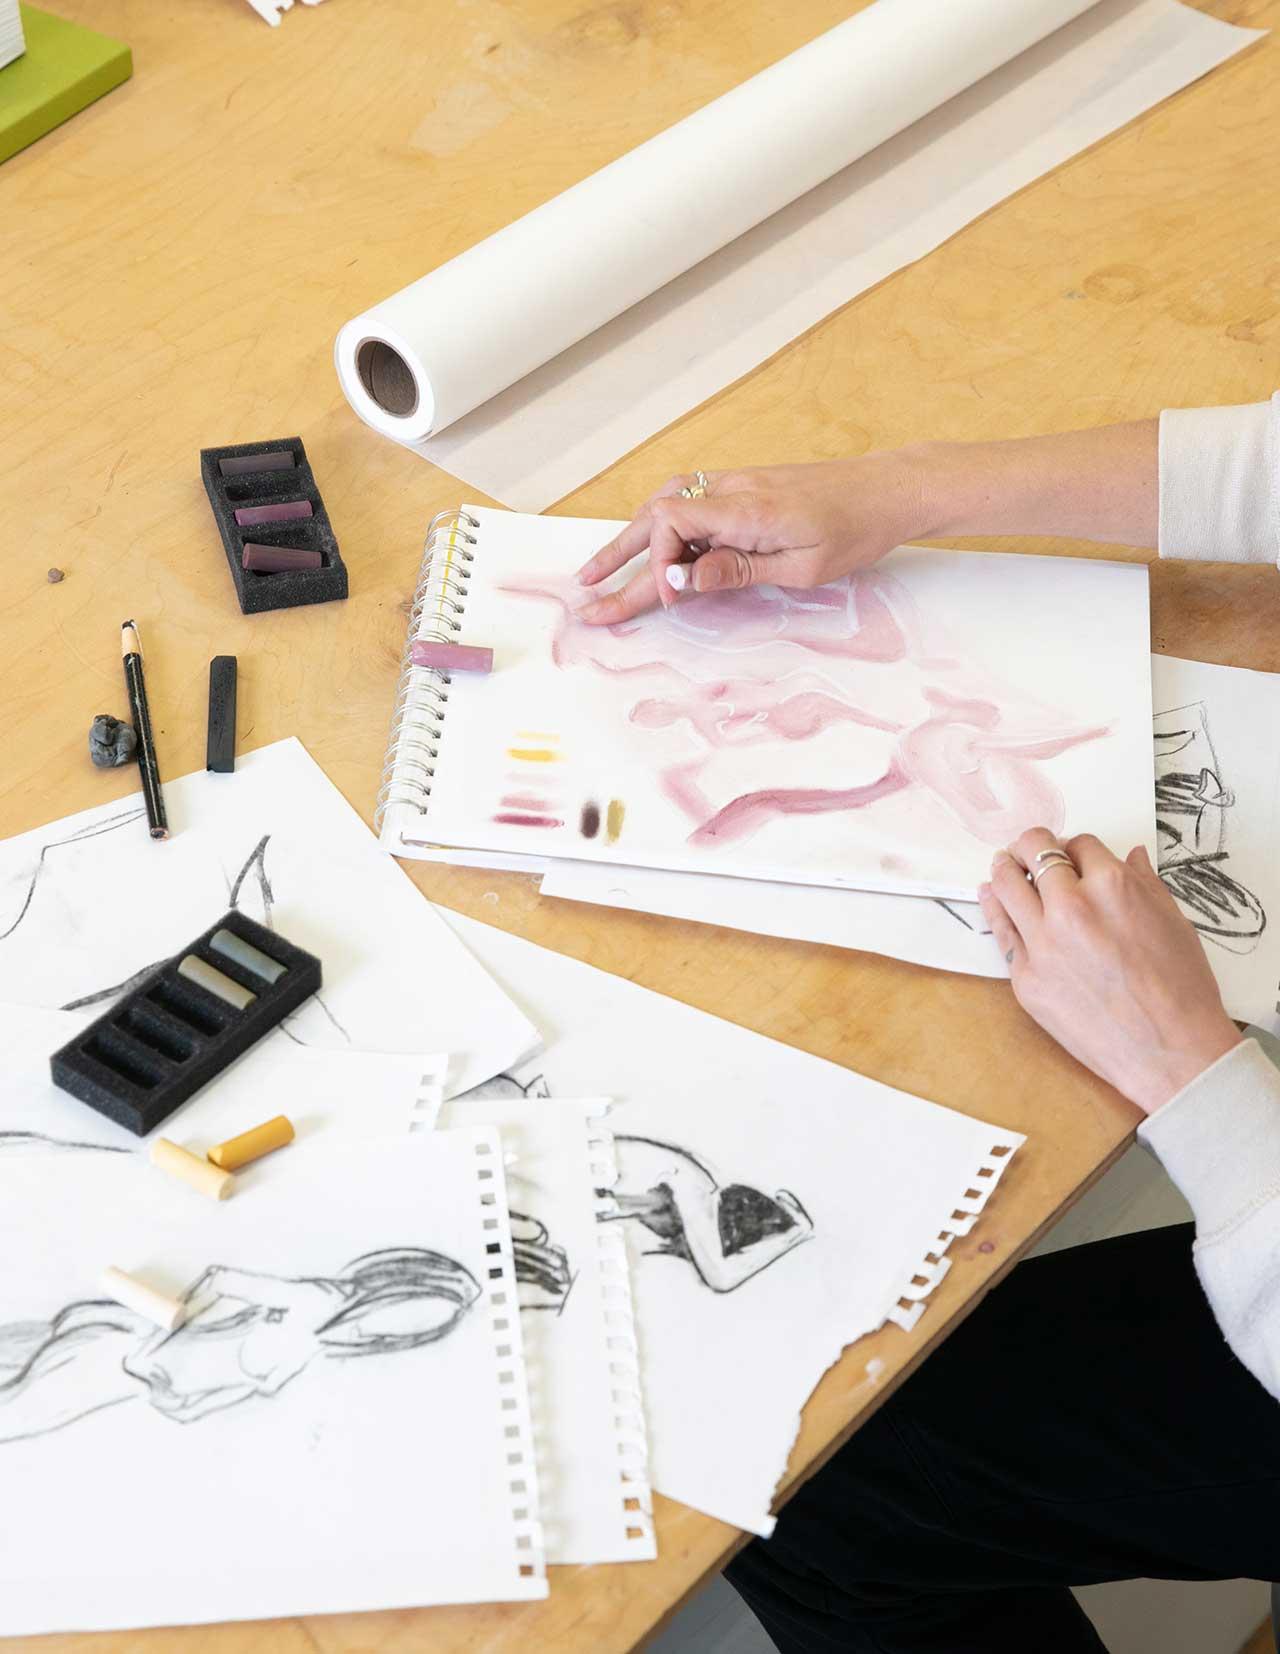 artist's hands sketching on paper